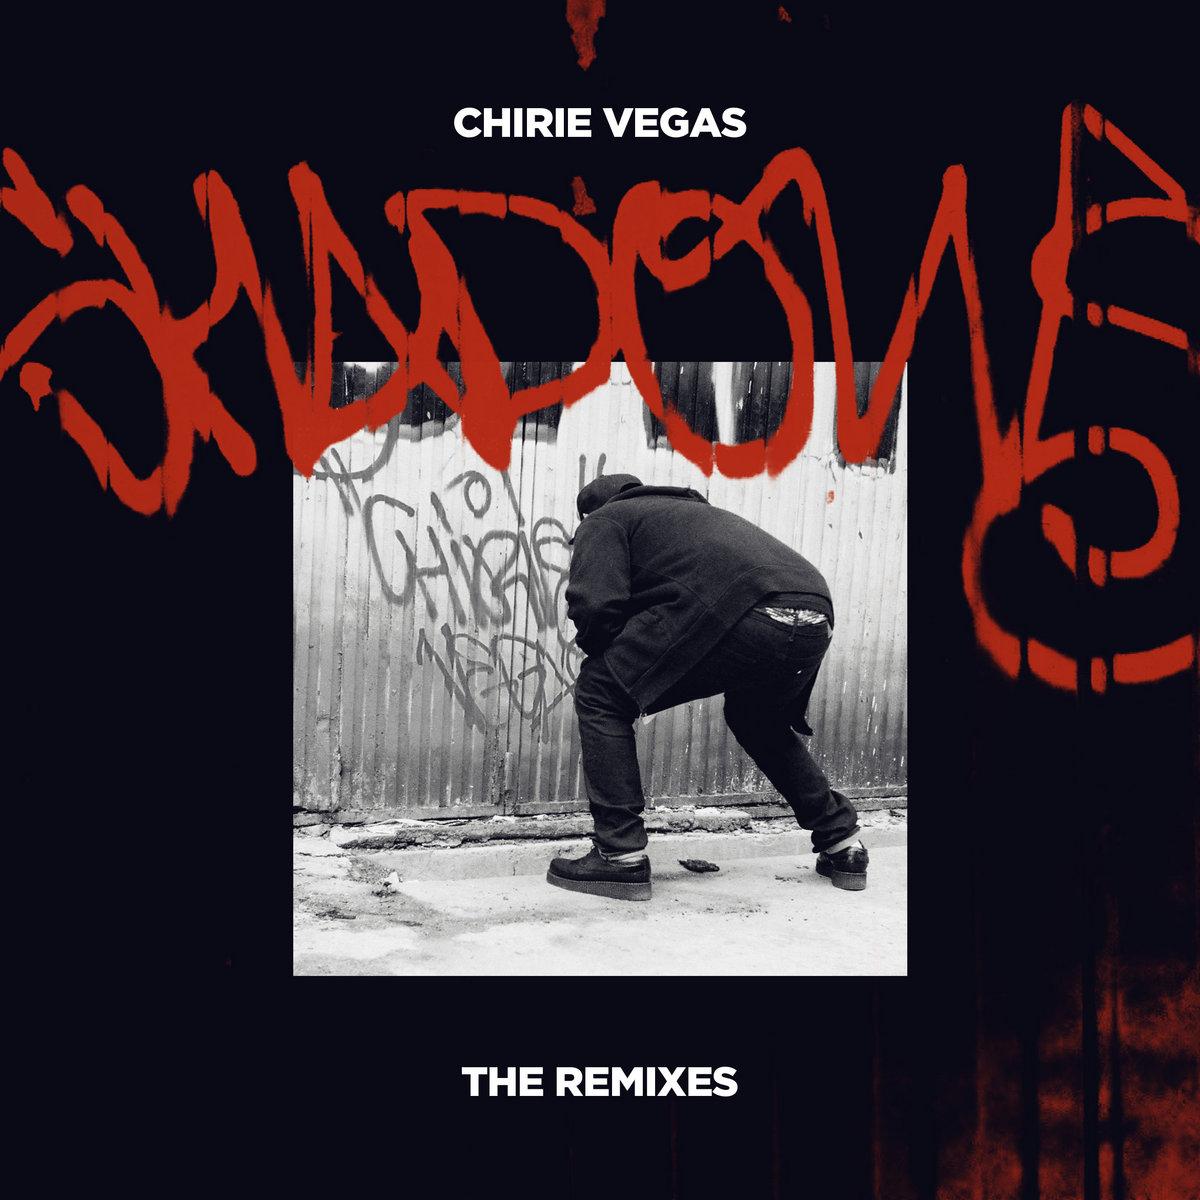 shadows chirie vegas